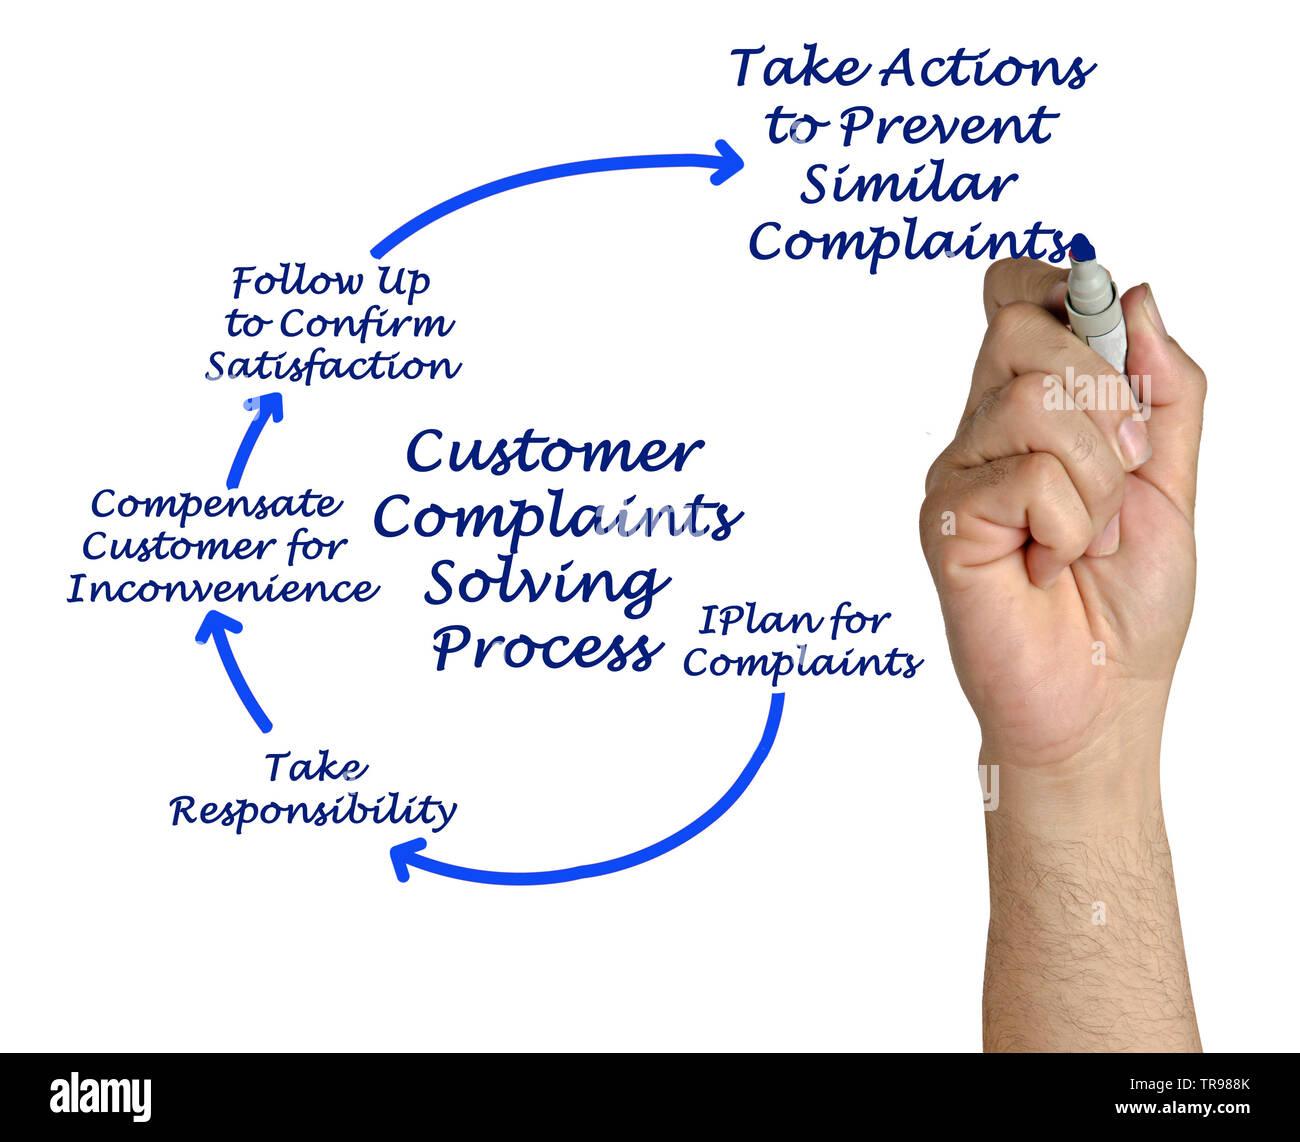 Customer Complaints Solving Process - Stock Image